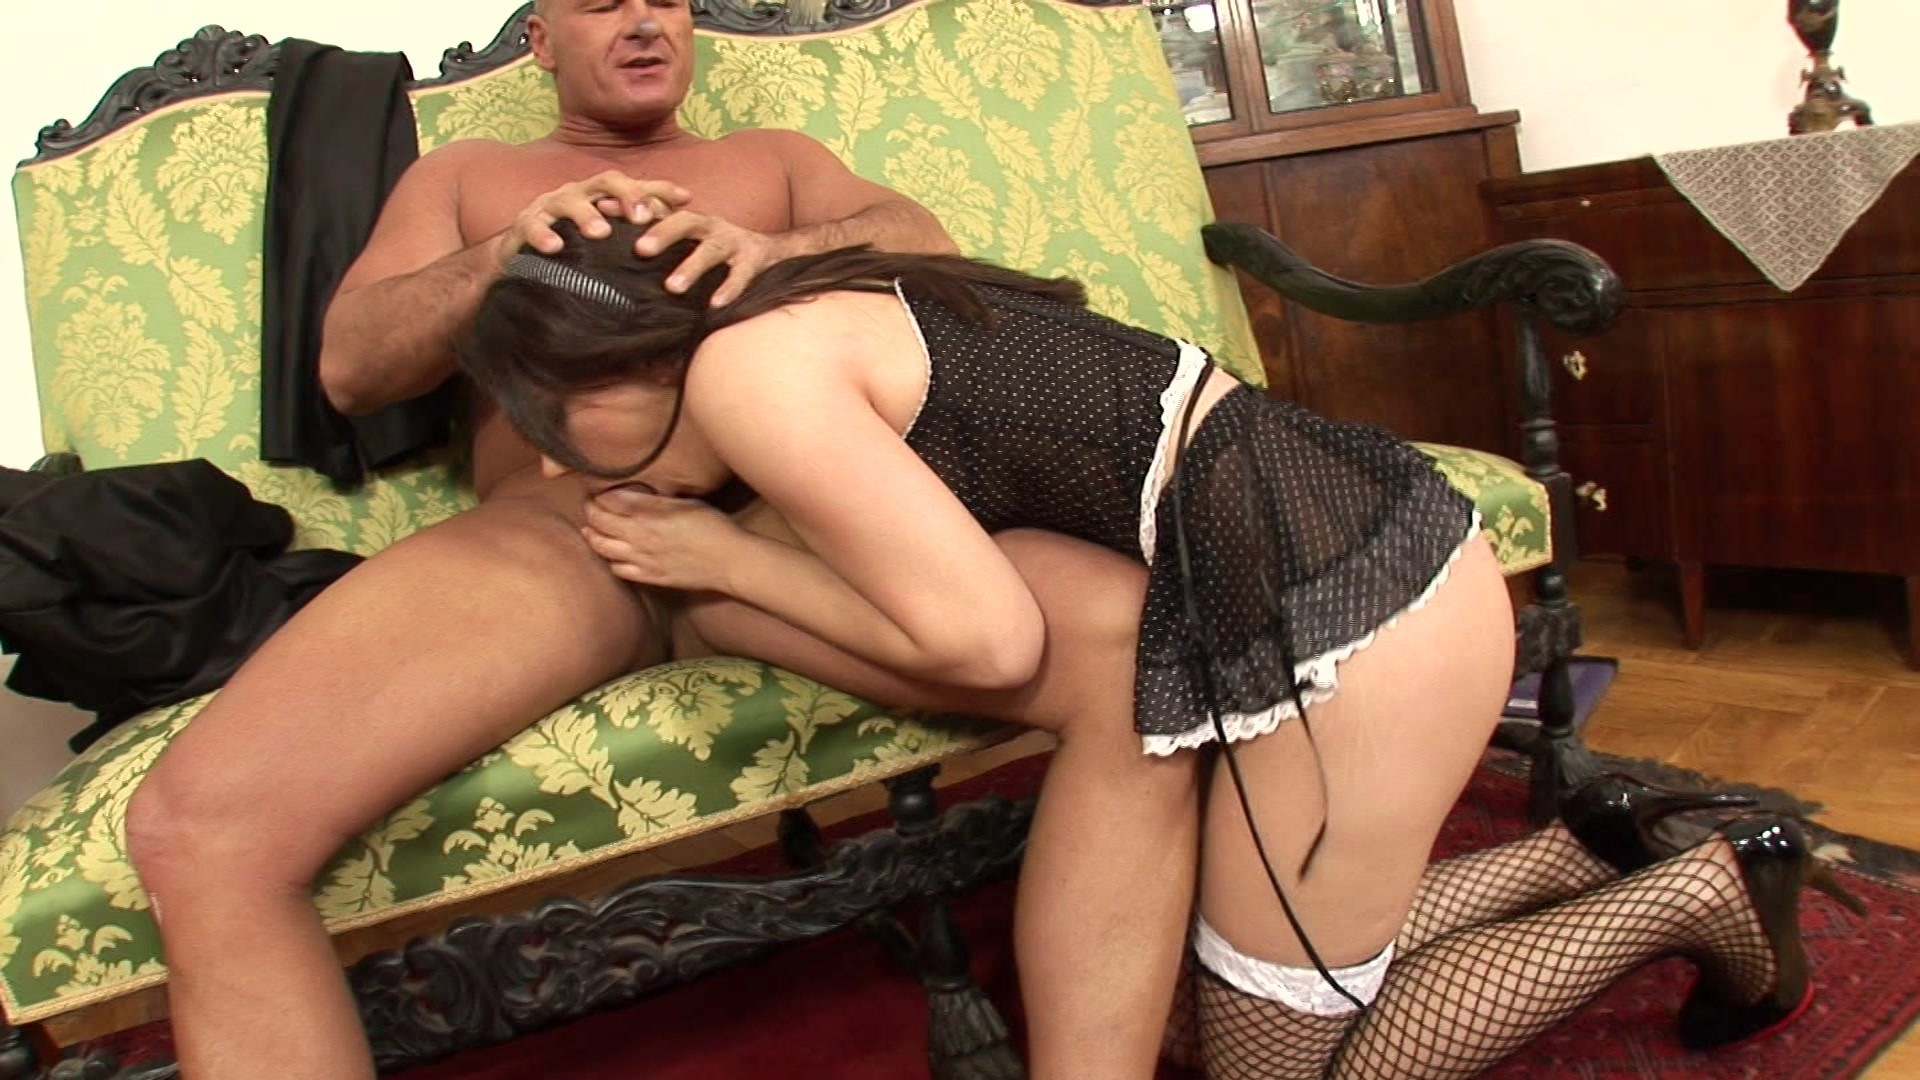 sex maids videos